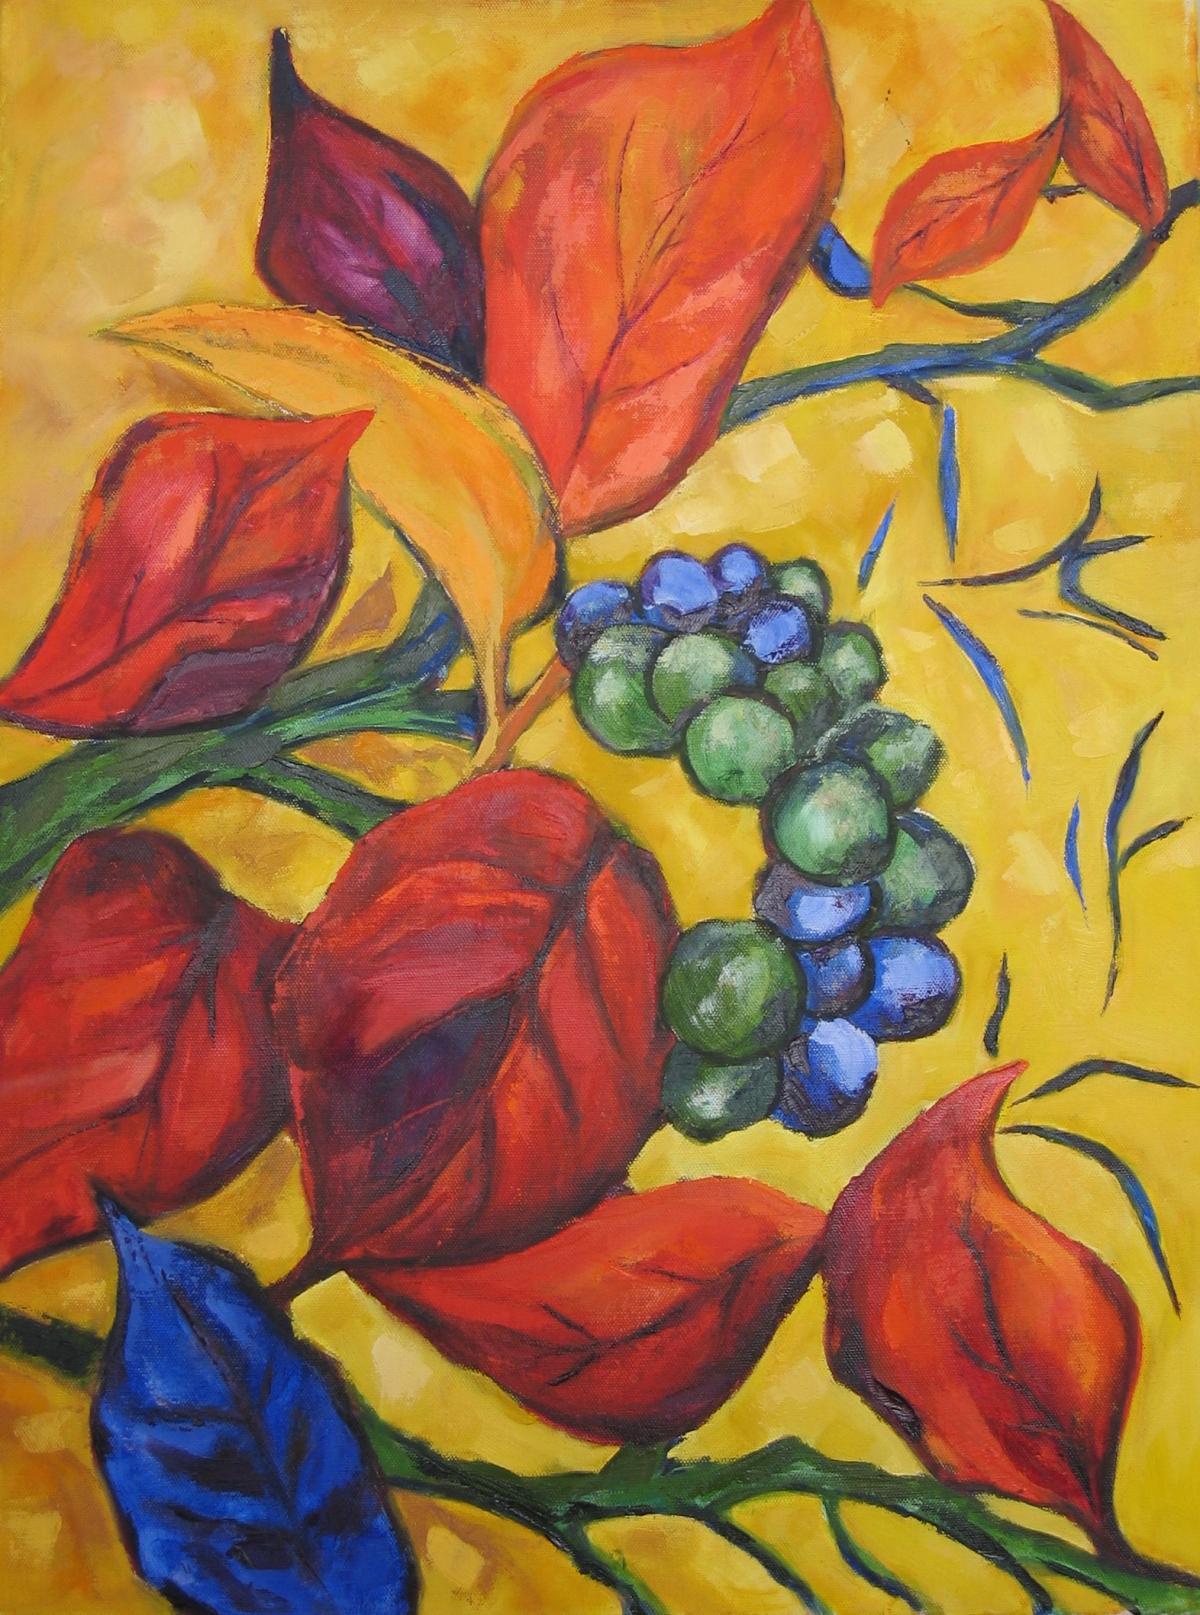 autumn-leaves-oil-on-canvas-46cm-x-60cm